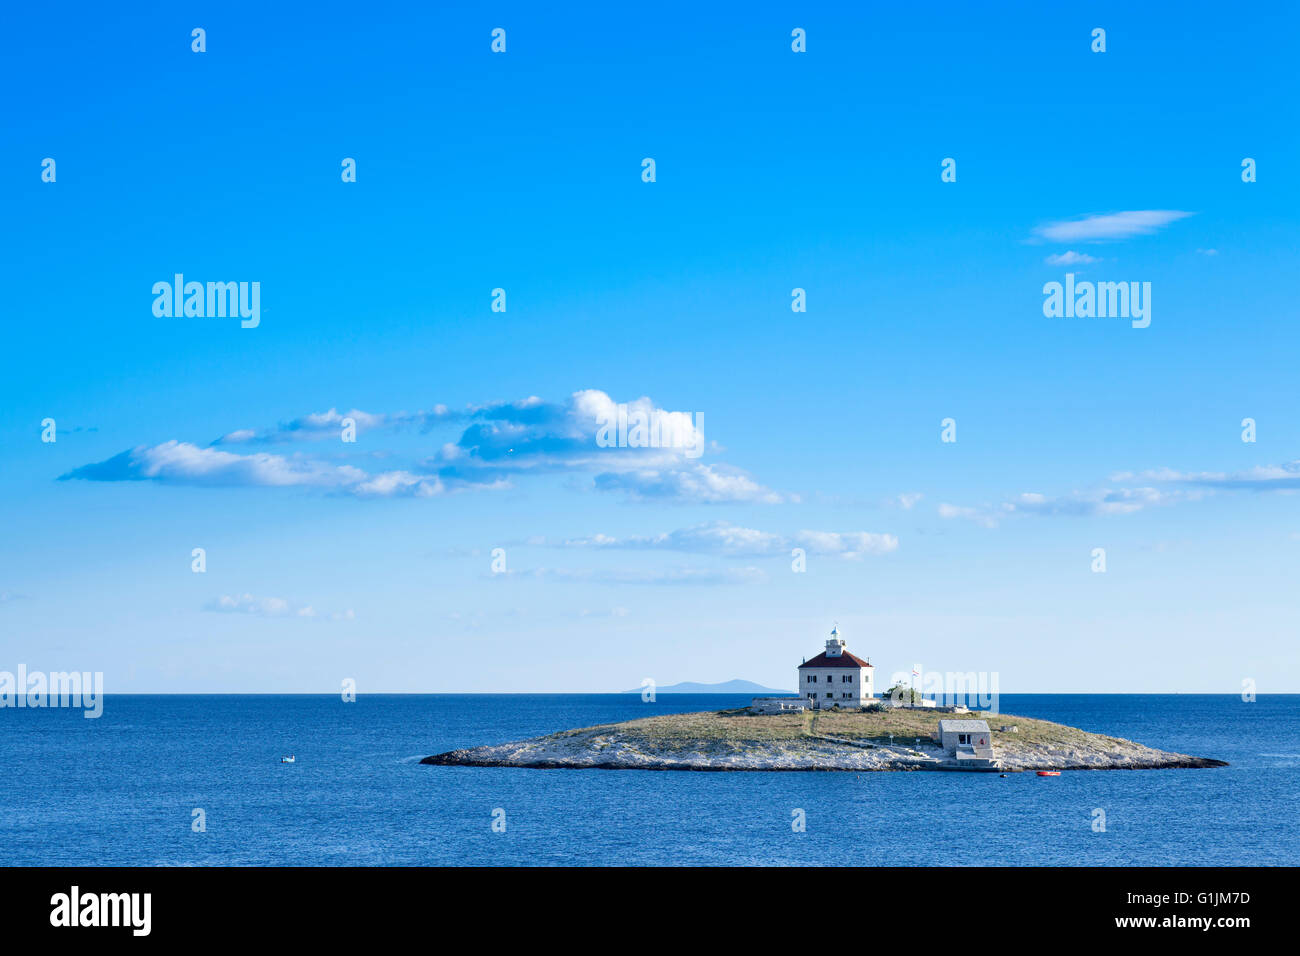 A lone island in the sea. Locaten in Croatia near island of Hvar - Stock Image